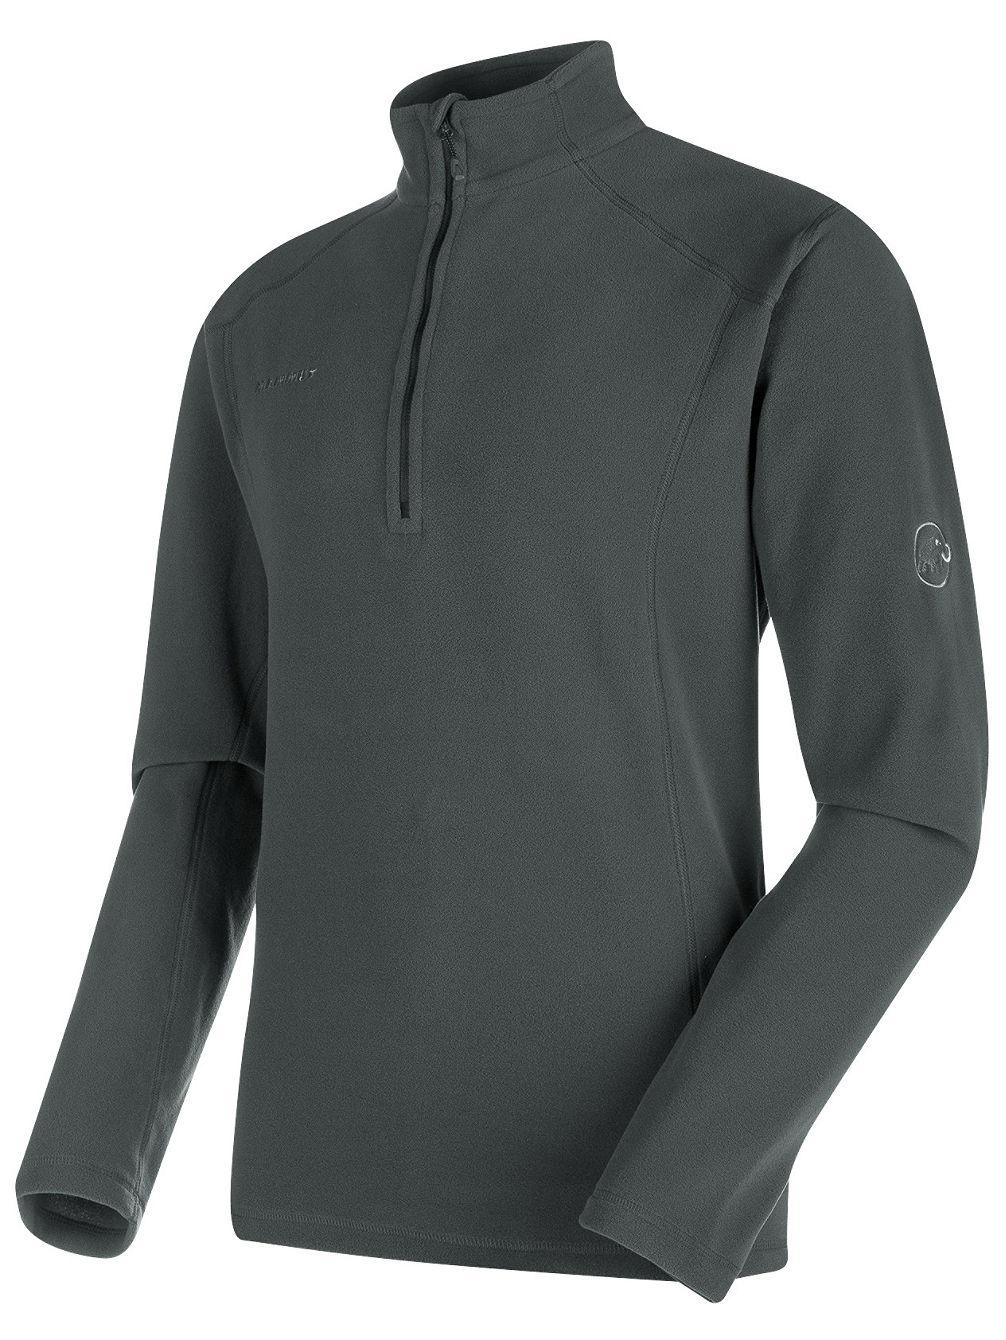 huge discount 5f4dc 7d010 Yadkin Ml Fleece Pullover